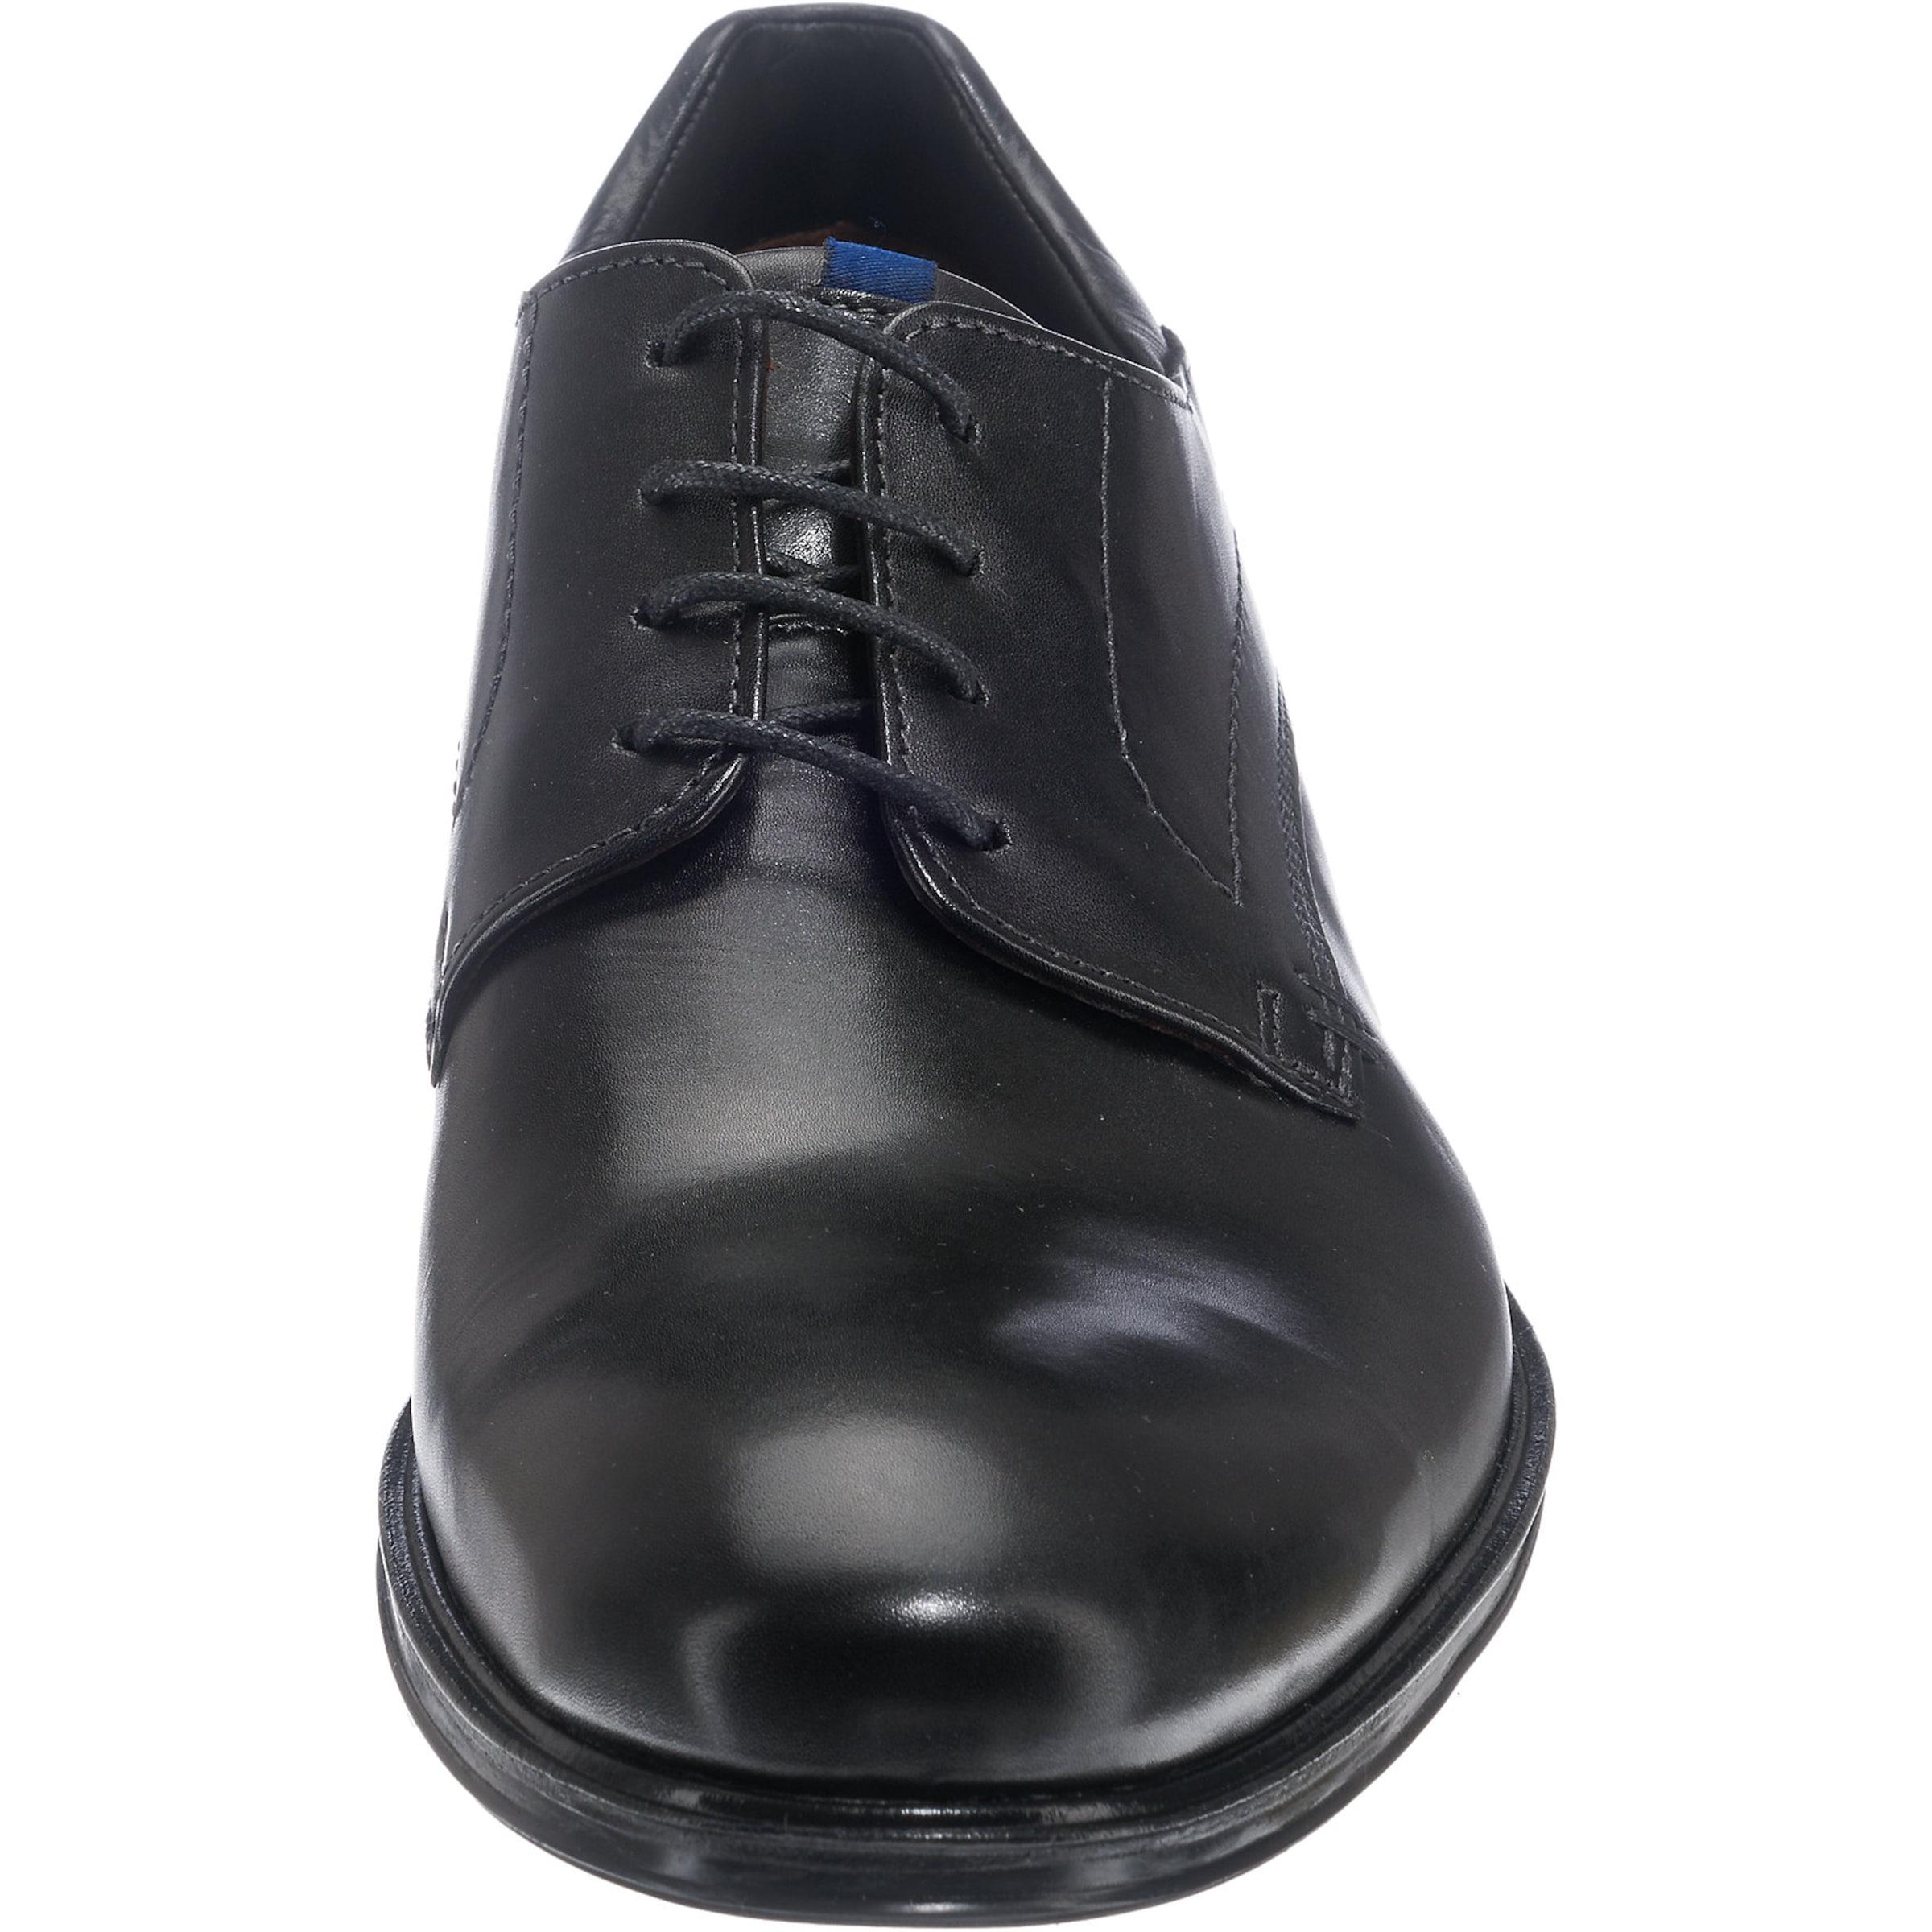 Schuhe Schwarz Business In Lloyd Milan tQdxsrBhC